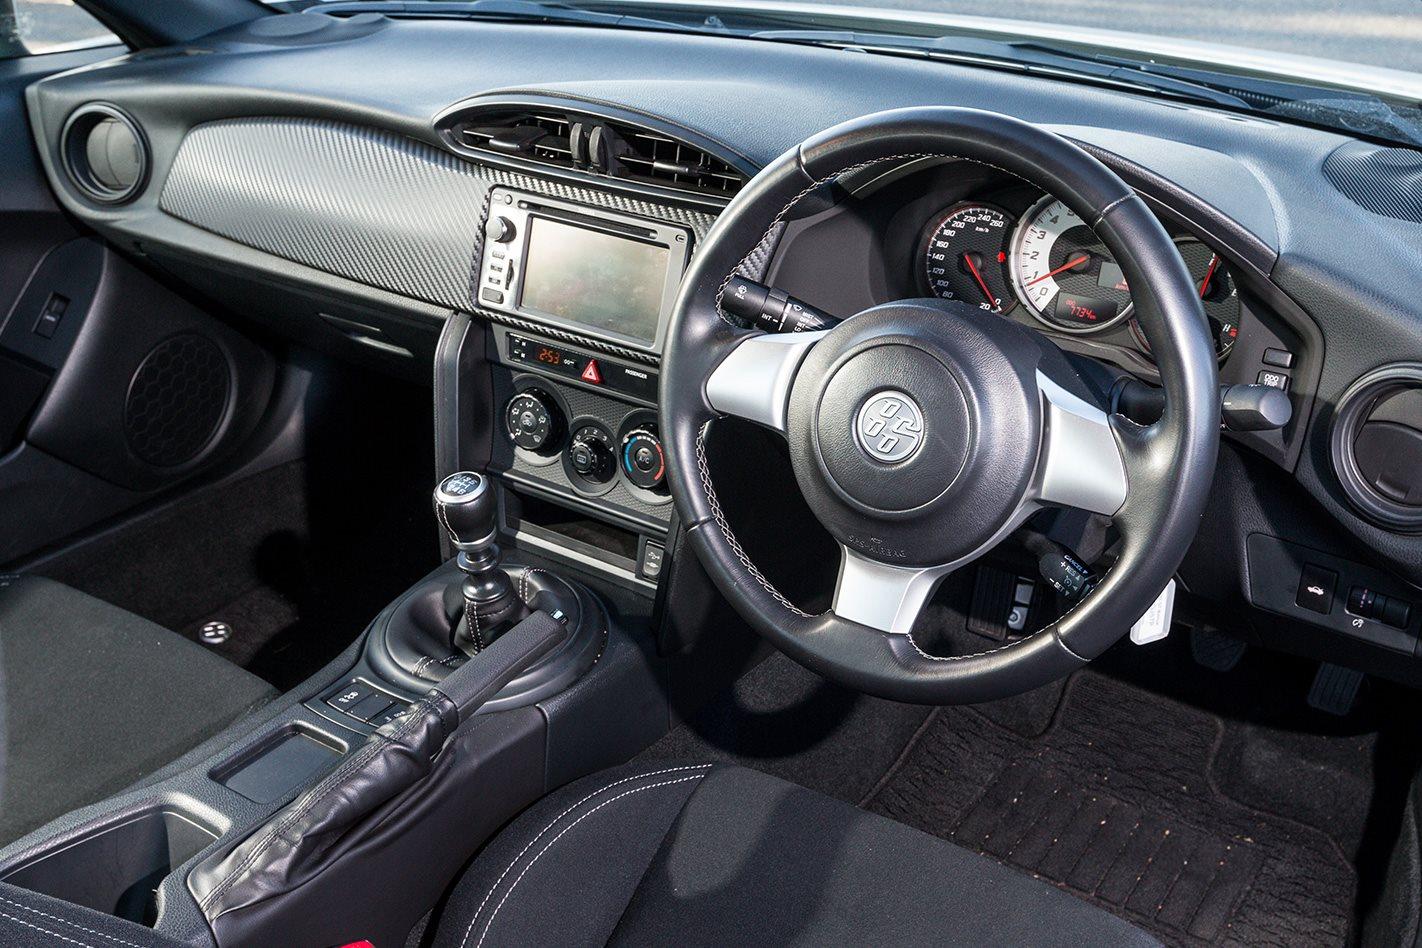 2017 Toyota 86 TRD interior